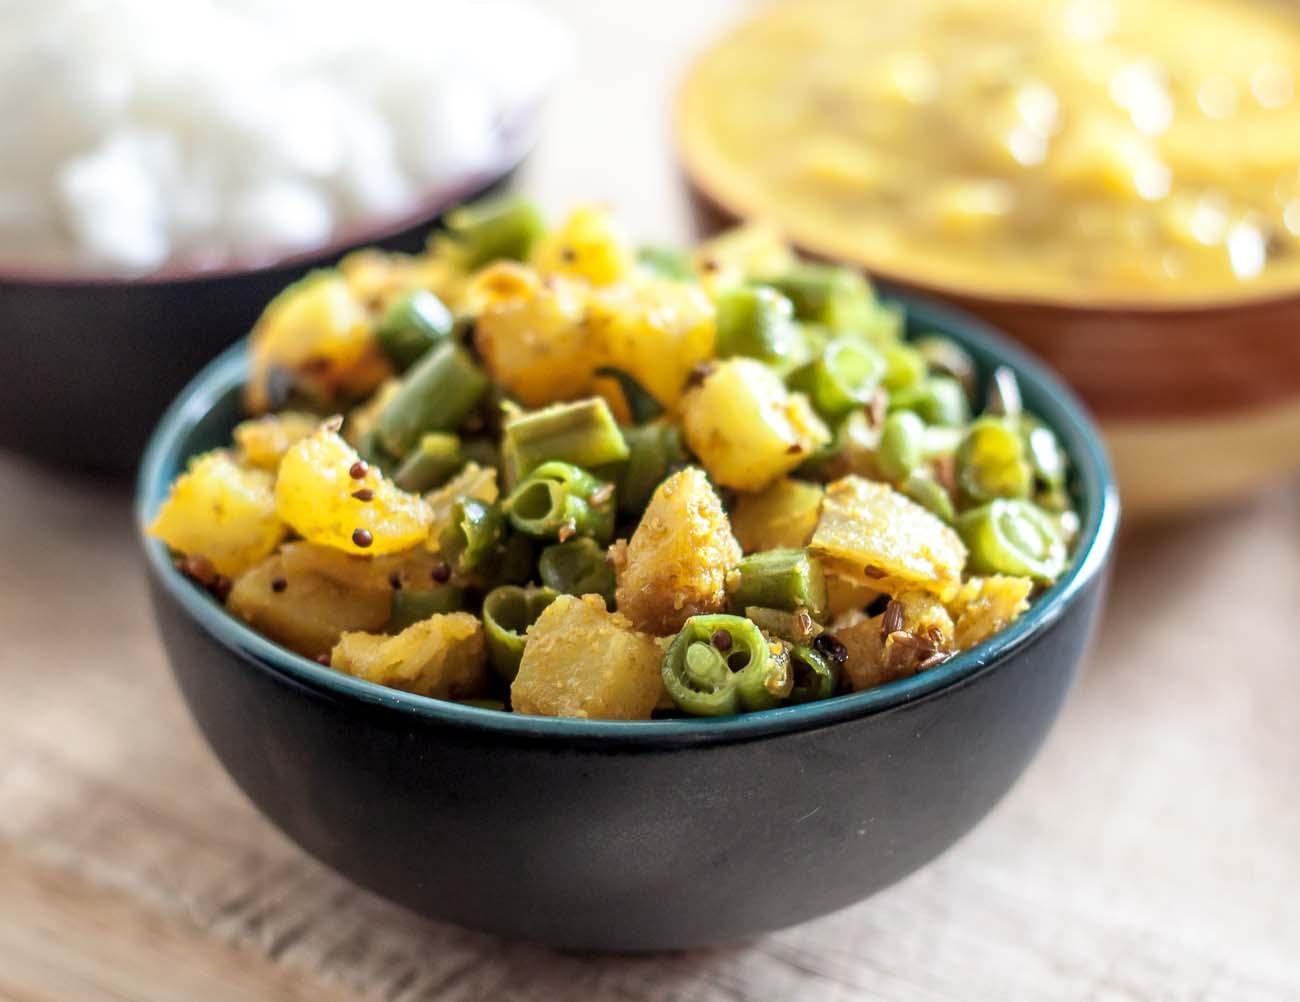 Shakarkand Beans Subzi Recipe (Spicy Sweet Potato Beans Stir fry)